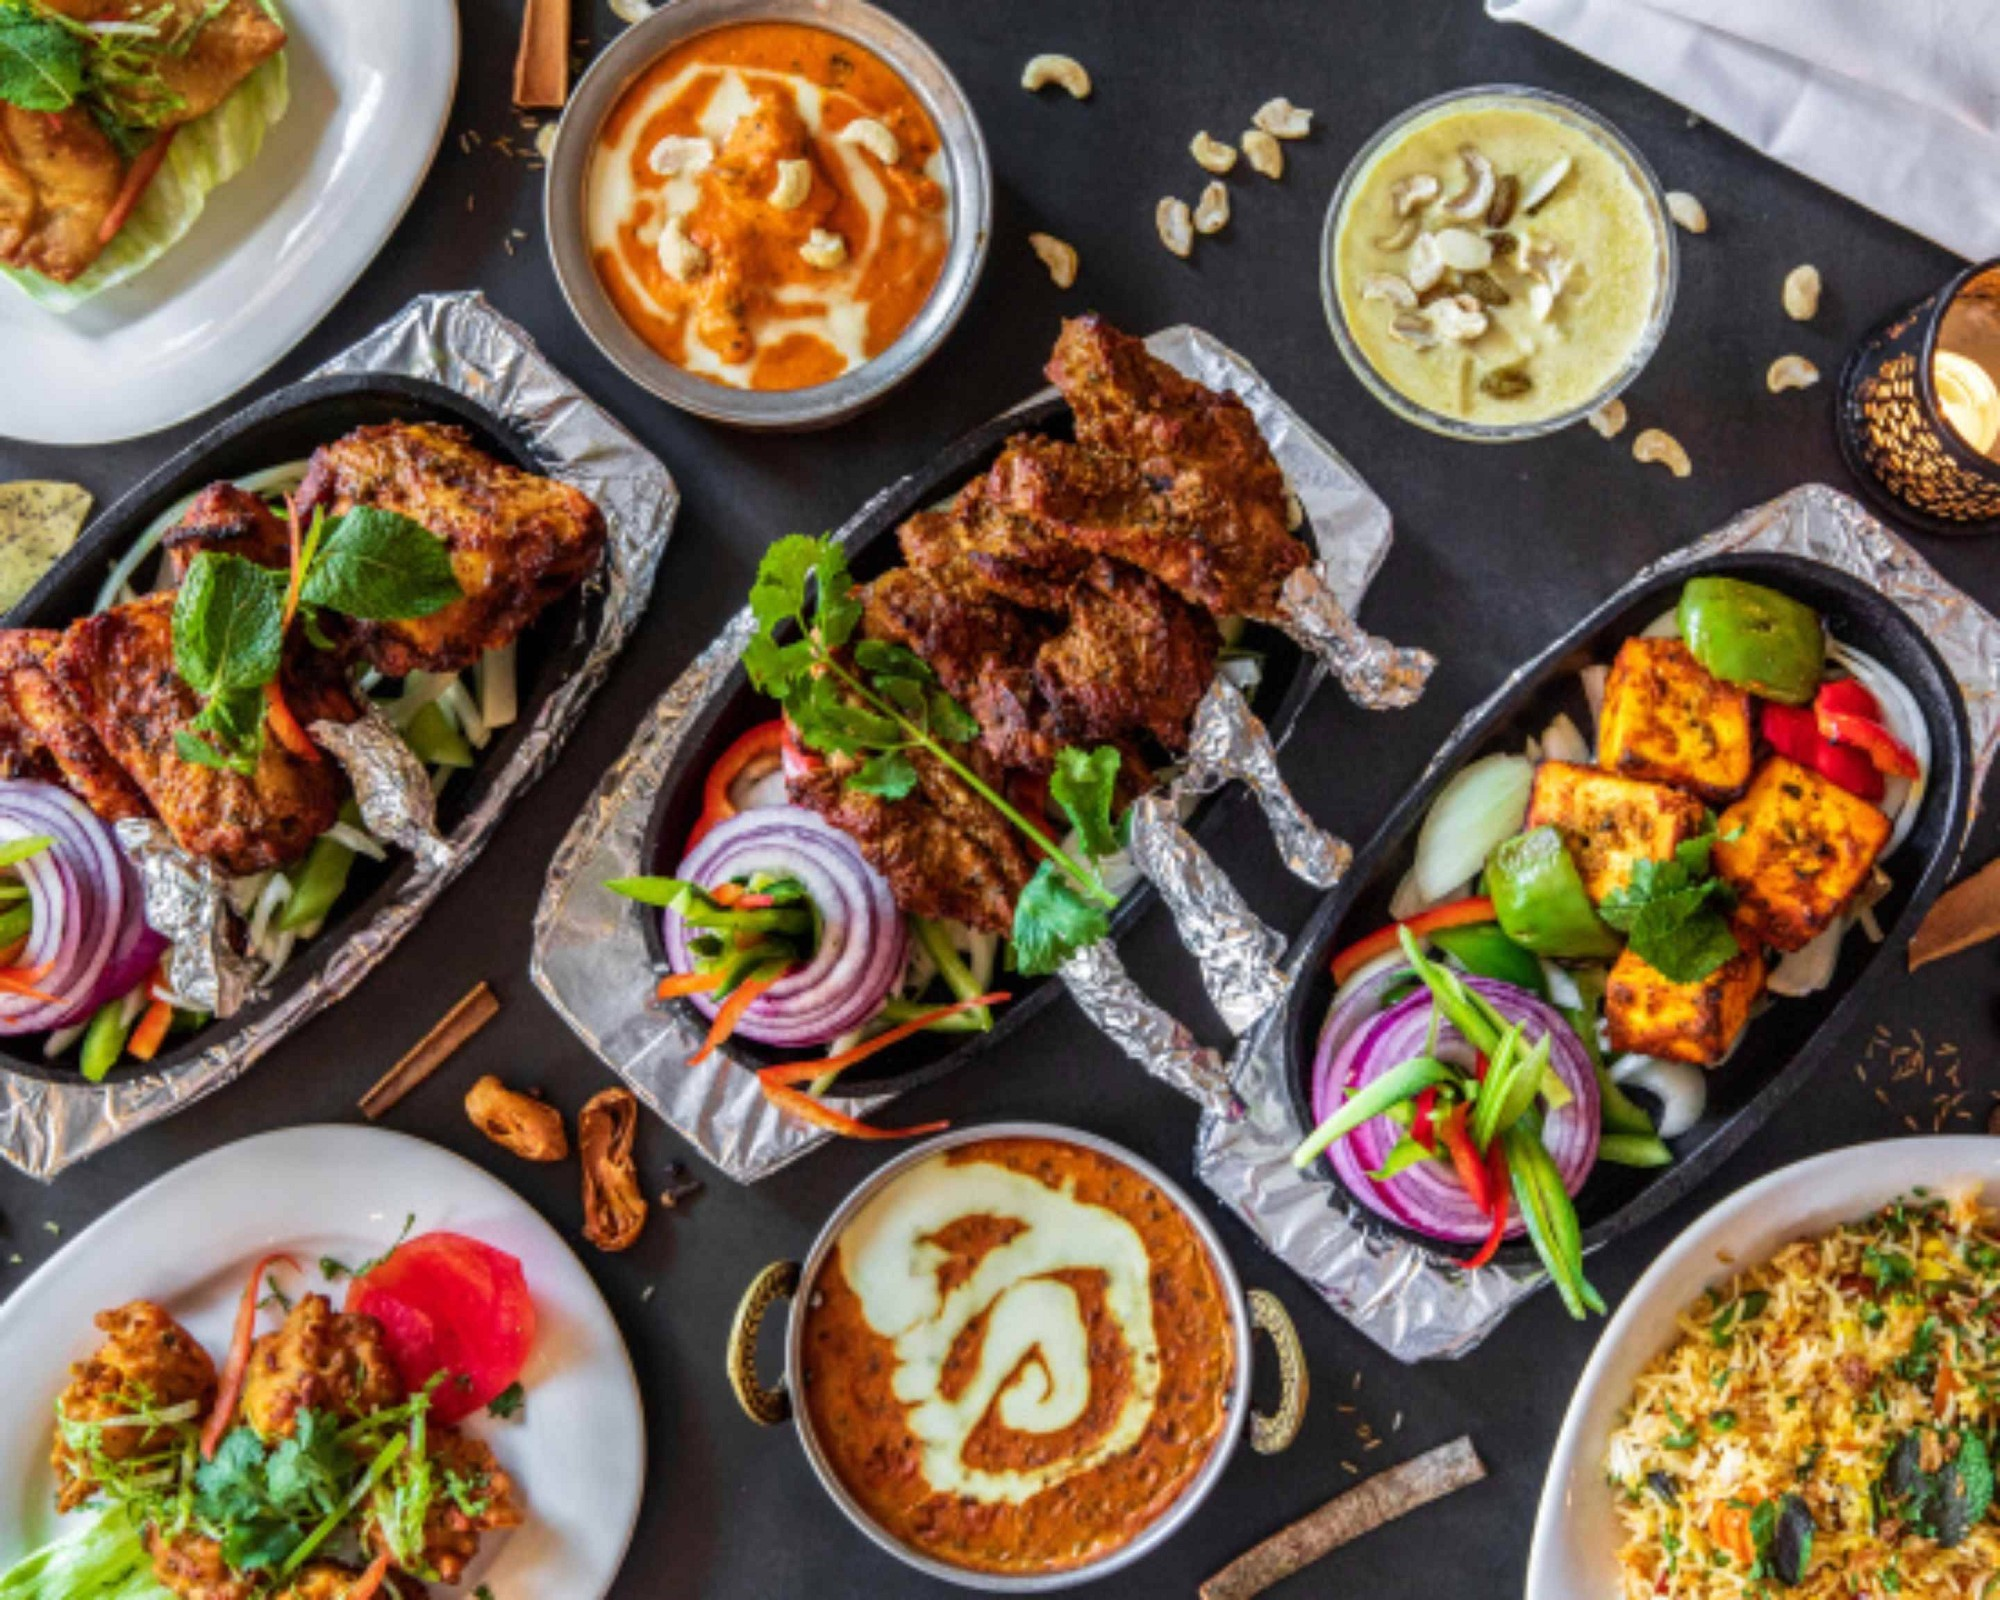 Ganesha Restaurant Authentic Indian Food in Restaurant Amsterdam